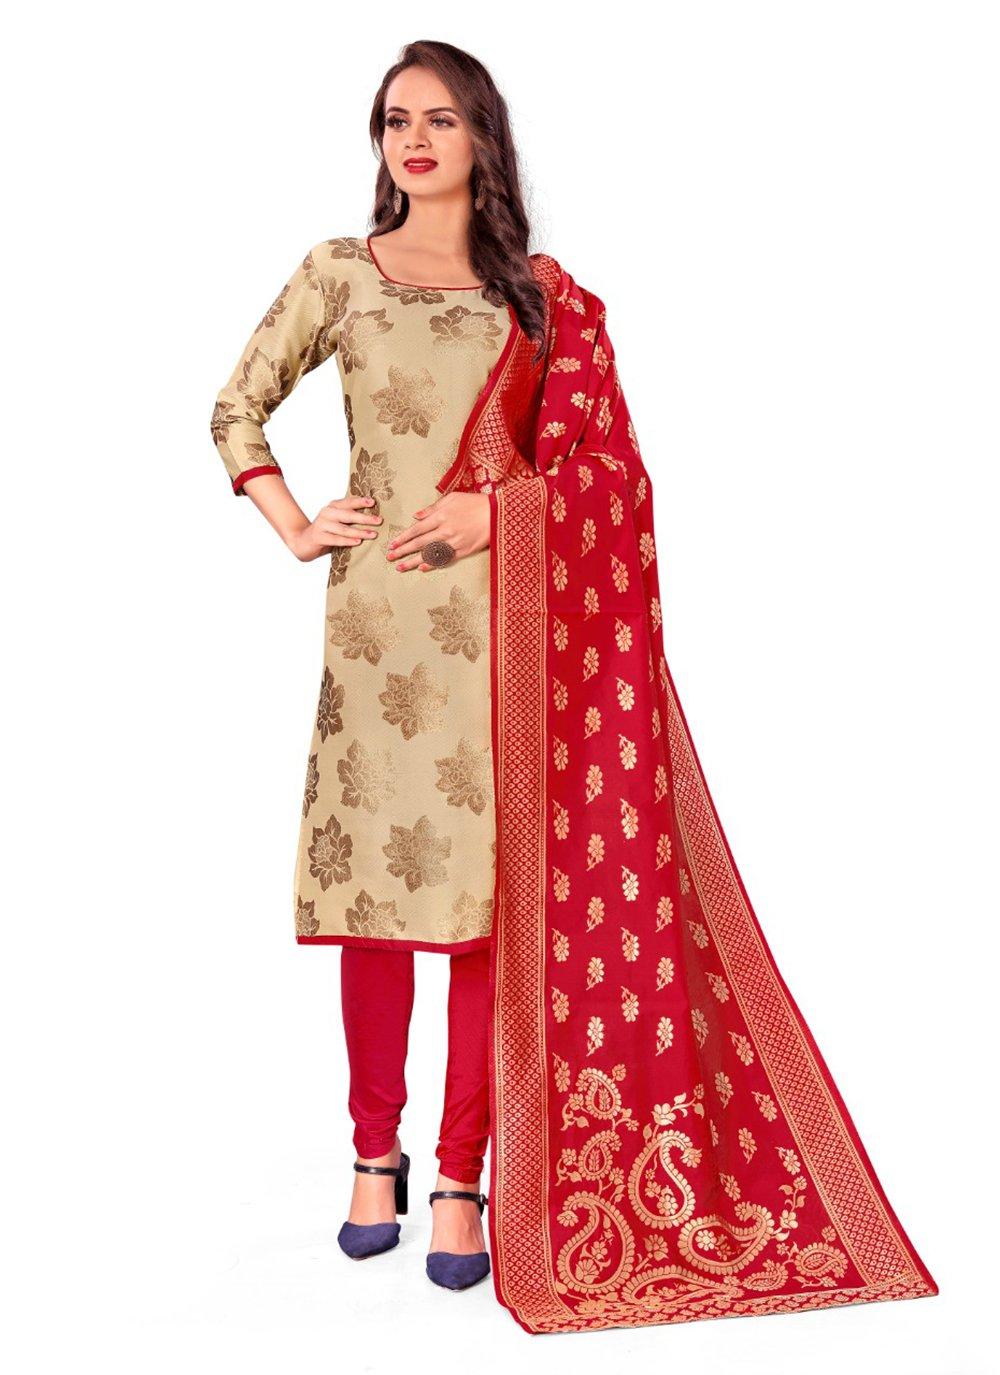 Banarasi Silk Churidar Designer Suit in Cream